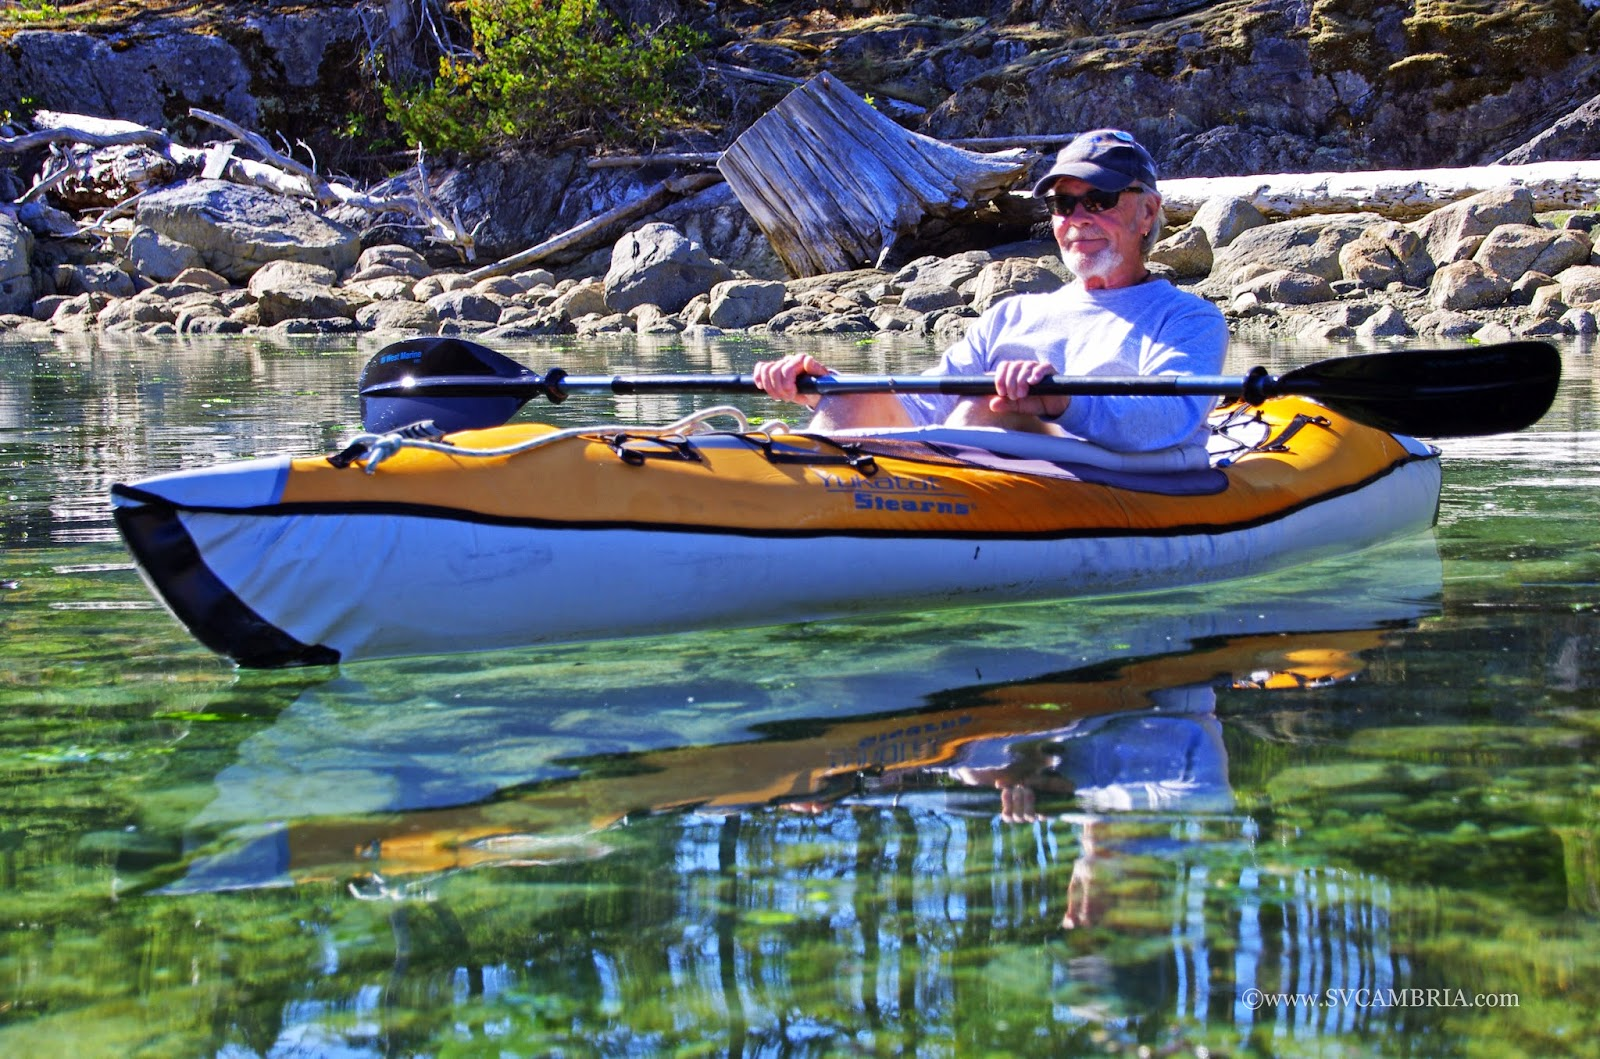 Kayaking in the Octopus Islands Marine Park.